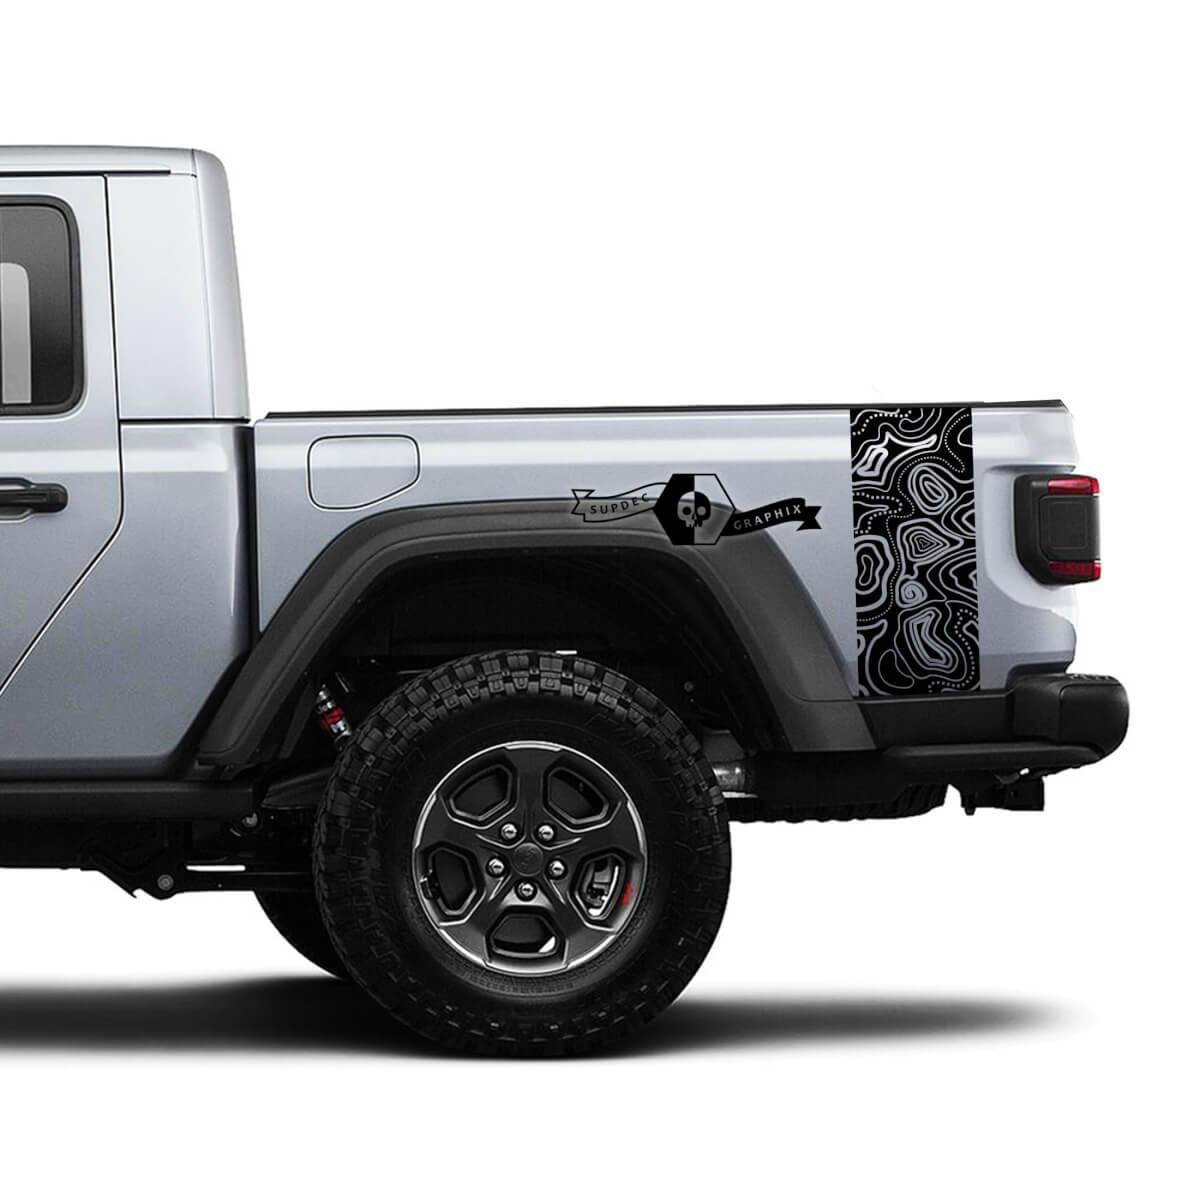 2 Jeep Gladiator Graphics Kit Vinyl Wrap Aufkleber Kontur Karte Seitenbett Streifen Aufkleber